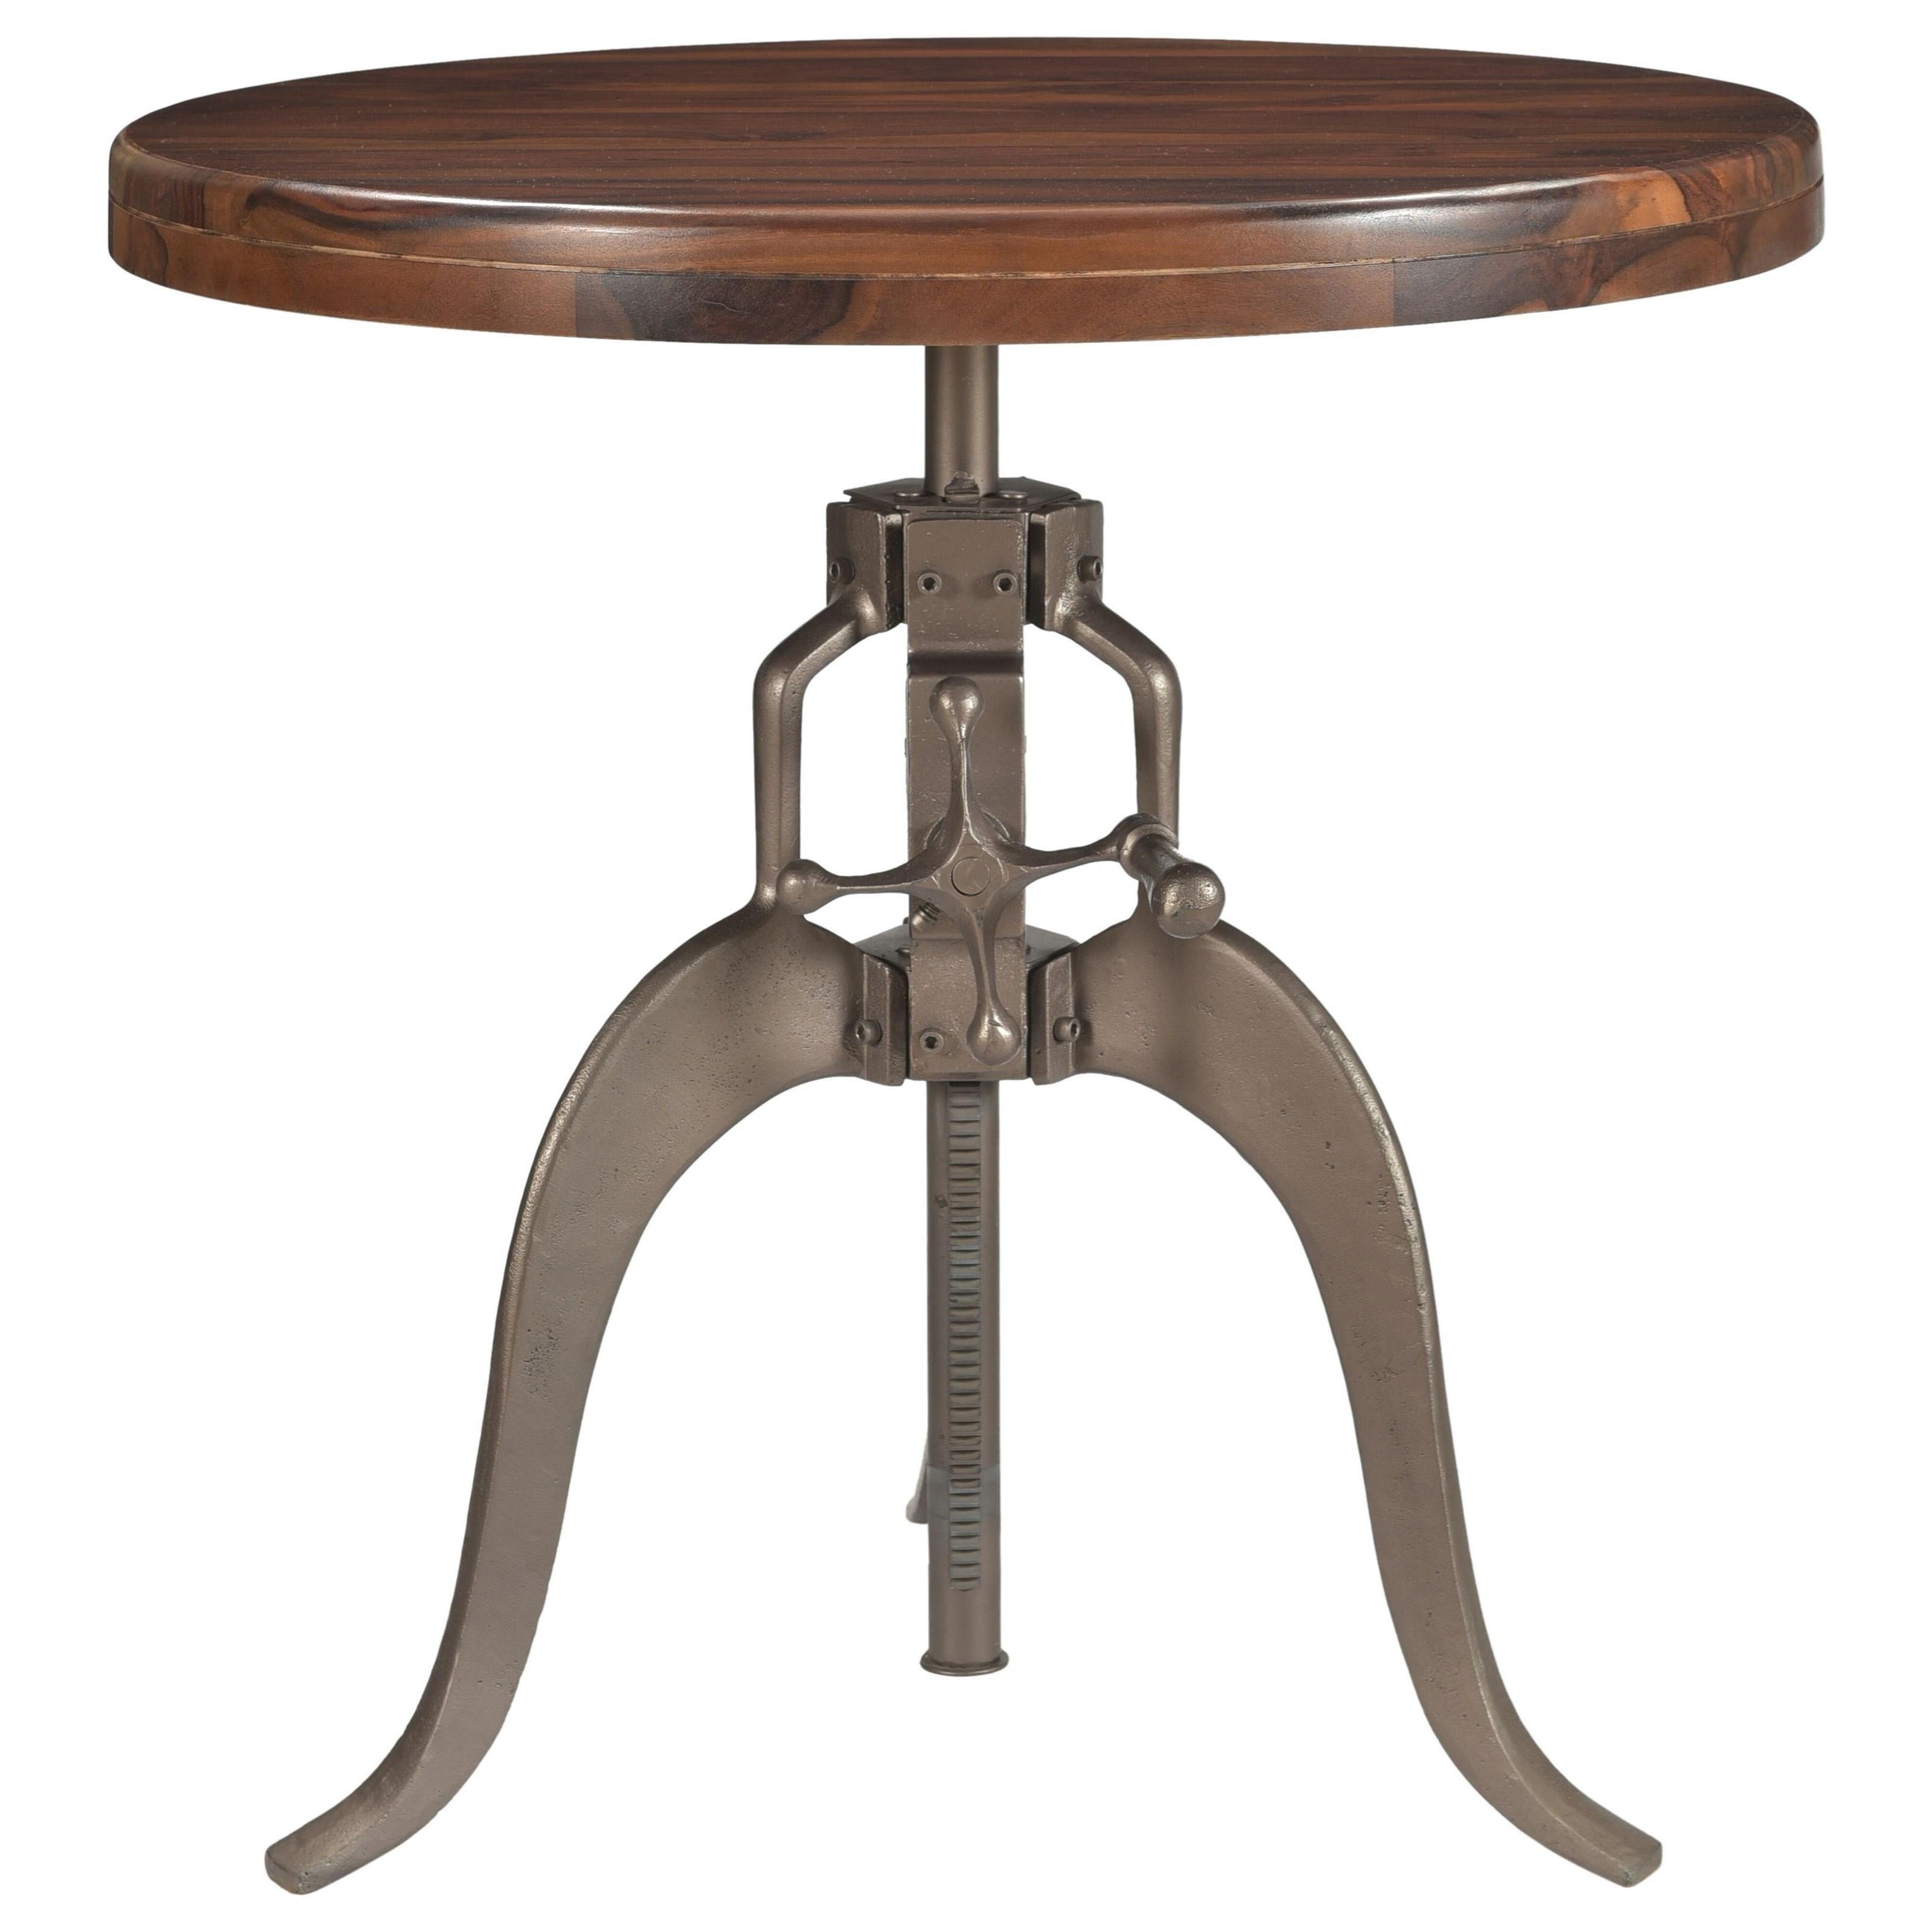 Bristol Round Adjustable Pub Table by C2C at Walker's Furniture